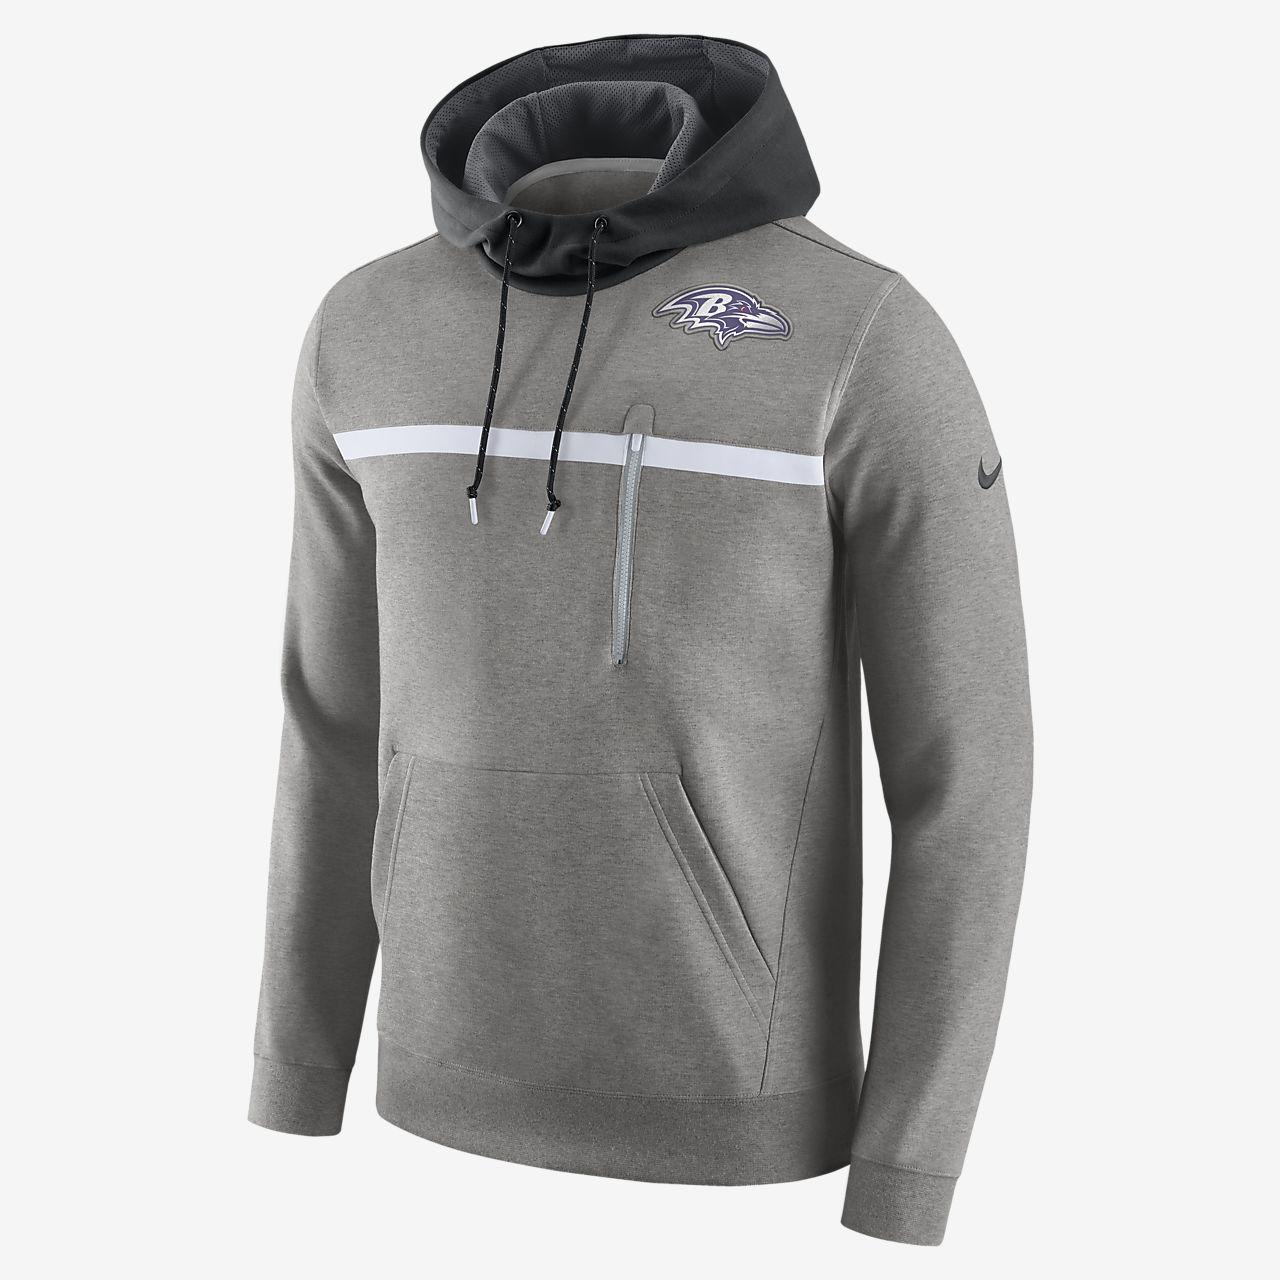 Nike Championship Drive Pullover (NFL Ravens) Herren Hoodie